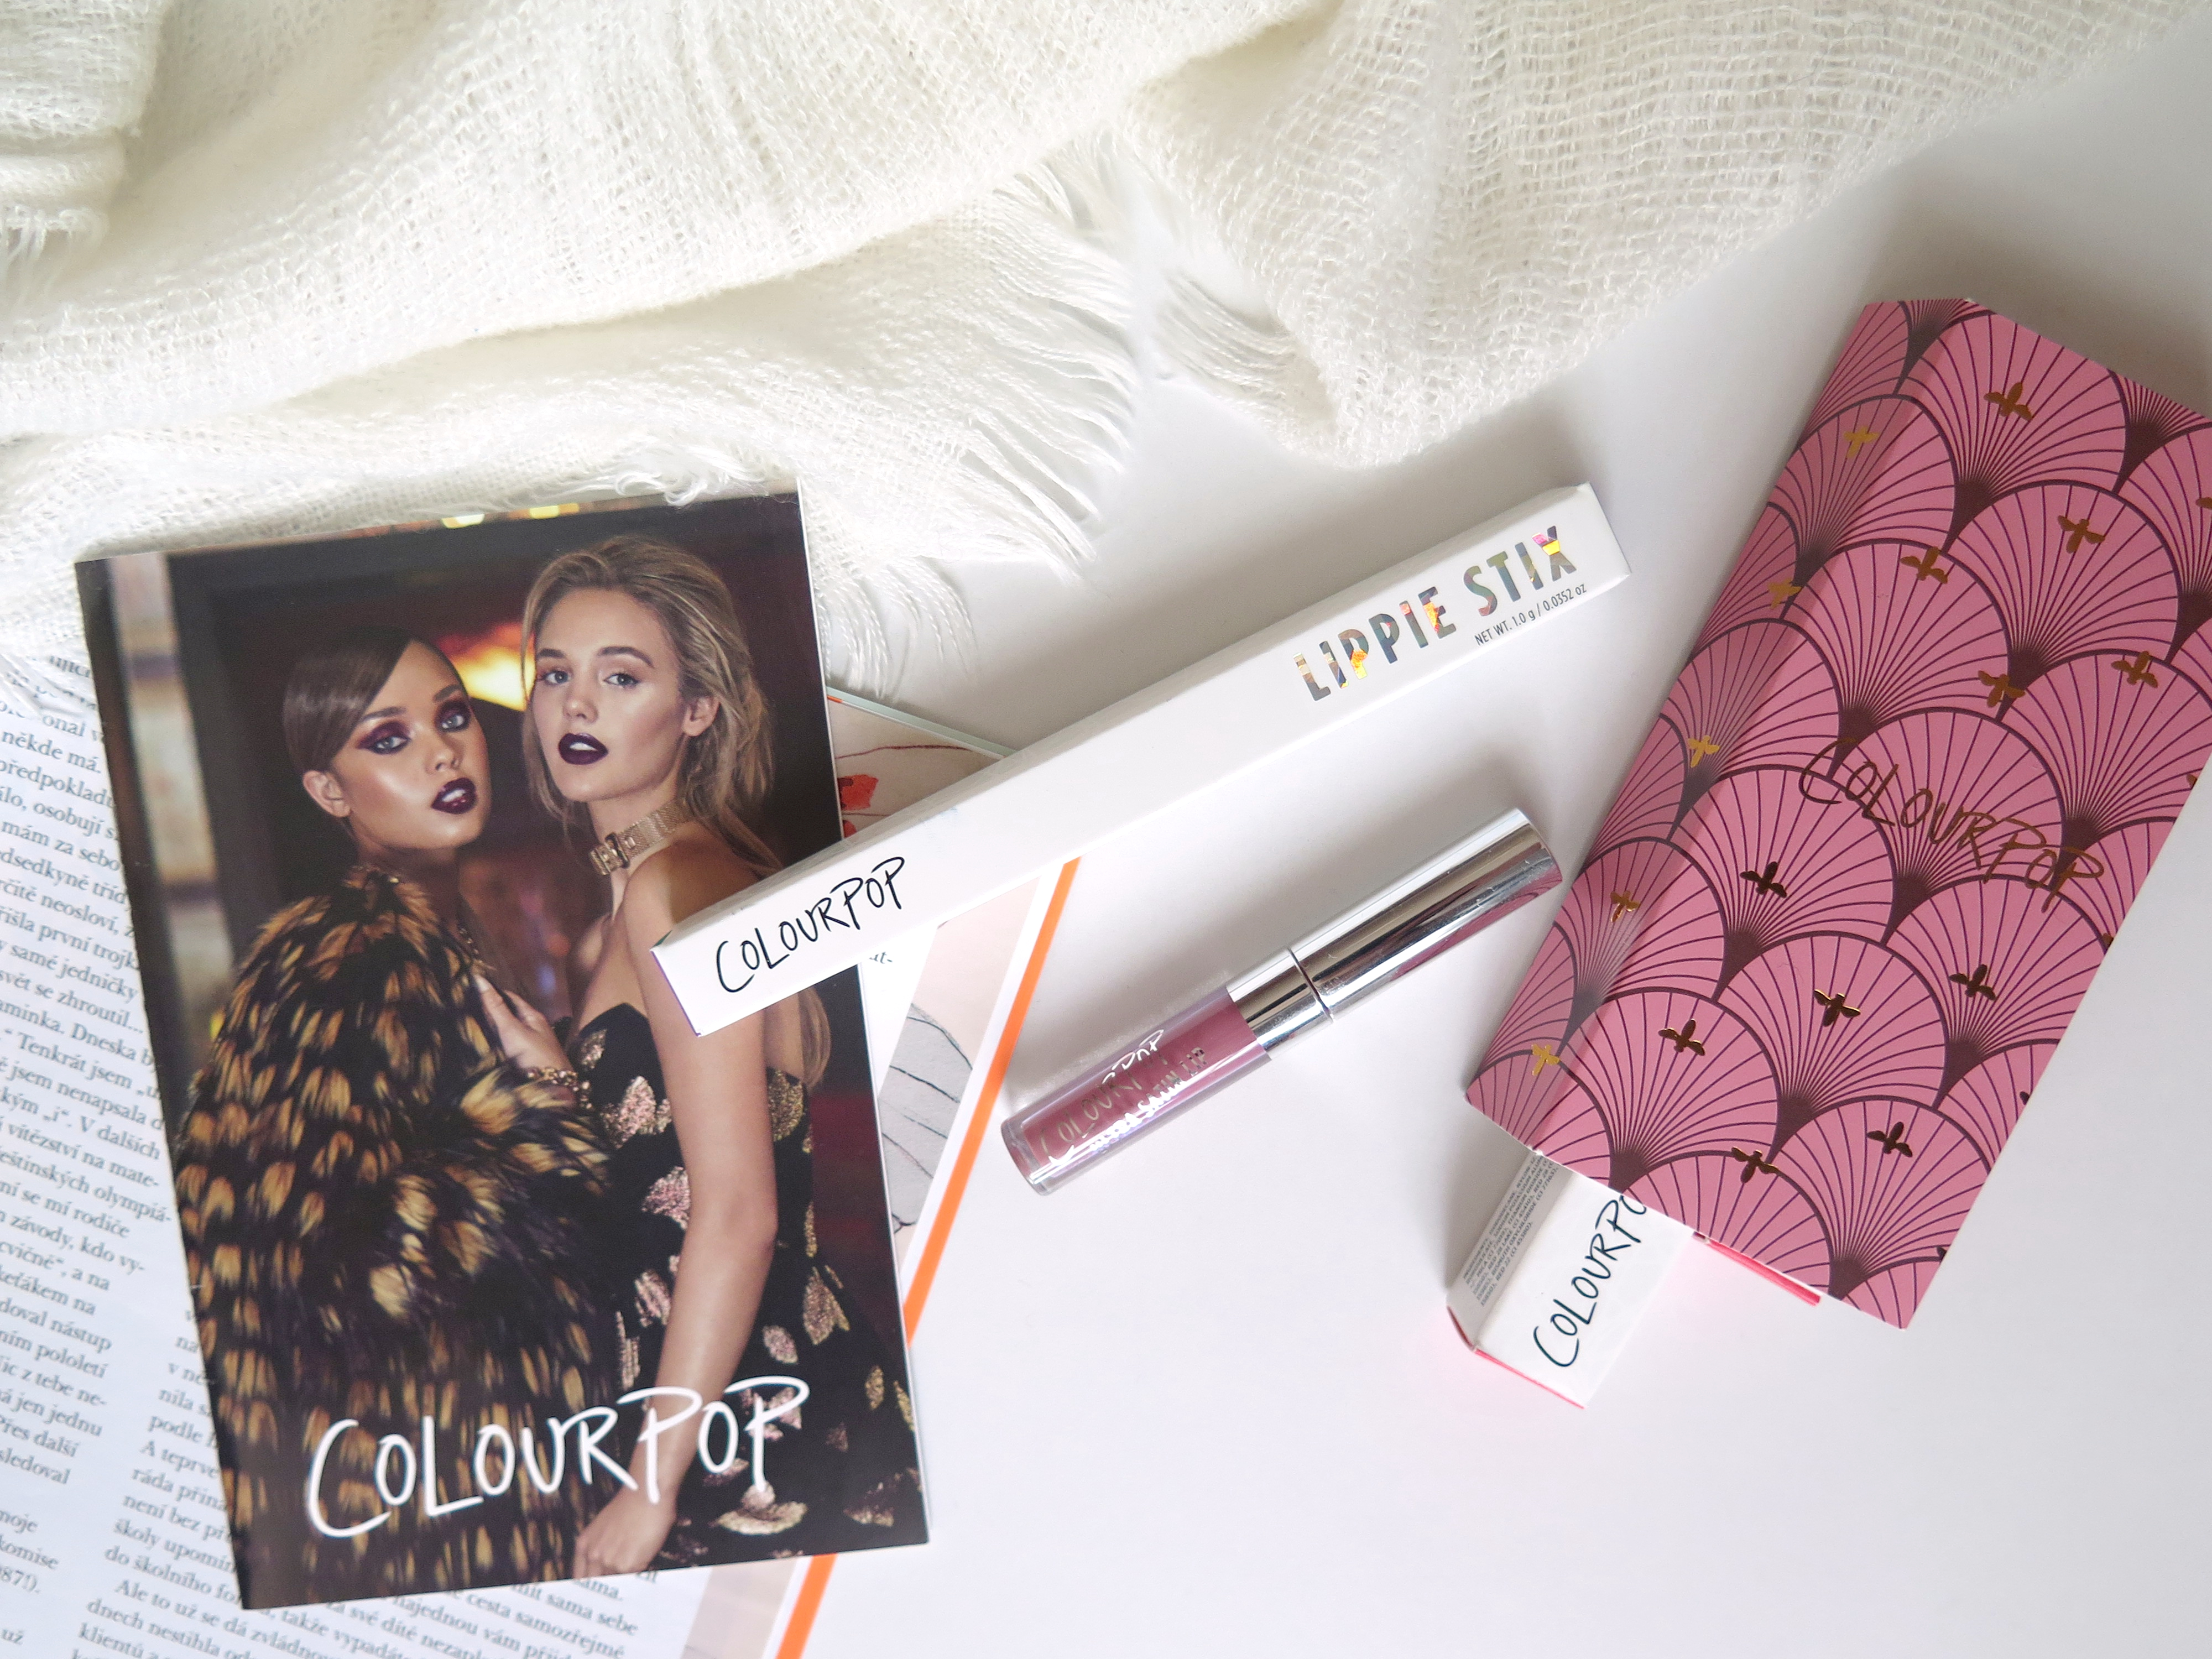 colourpop_lipsticks (1)